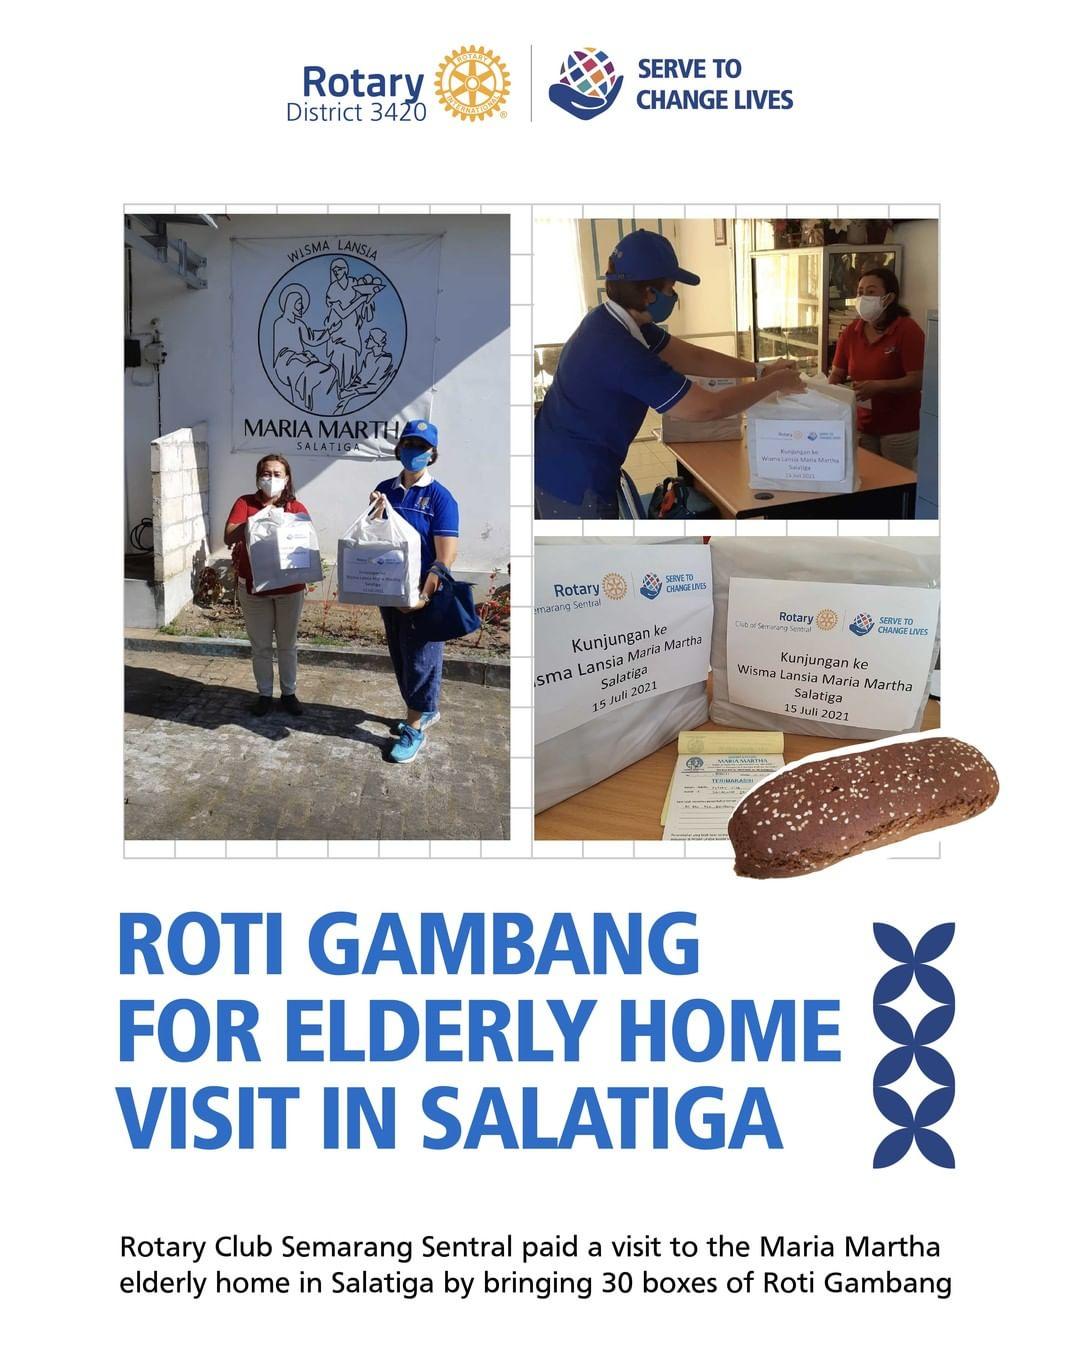 Roti Gambang for Elderly Home Visit in Salatiga